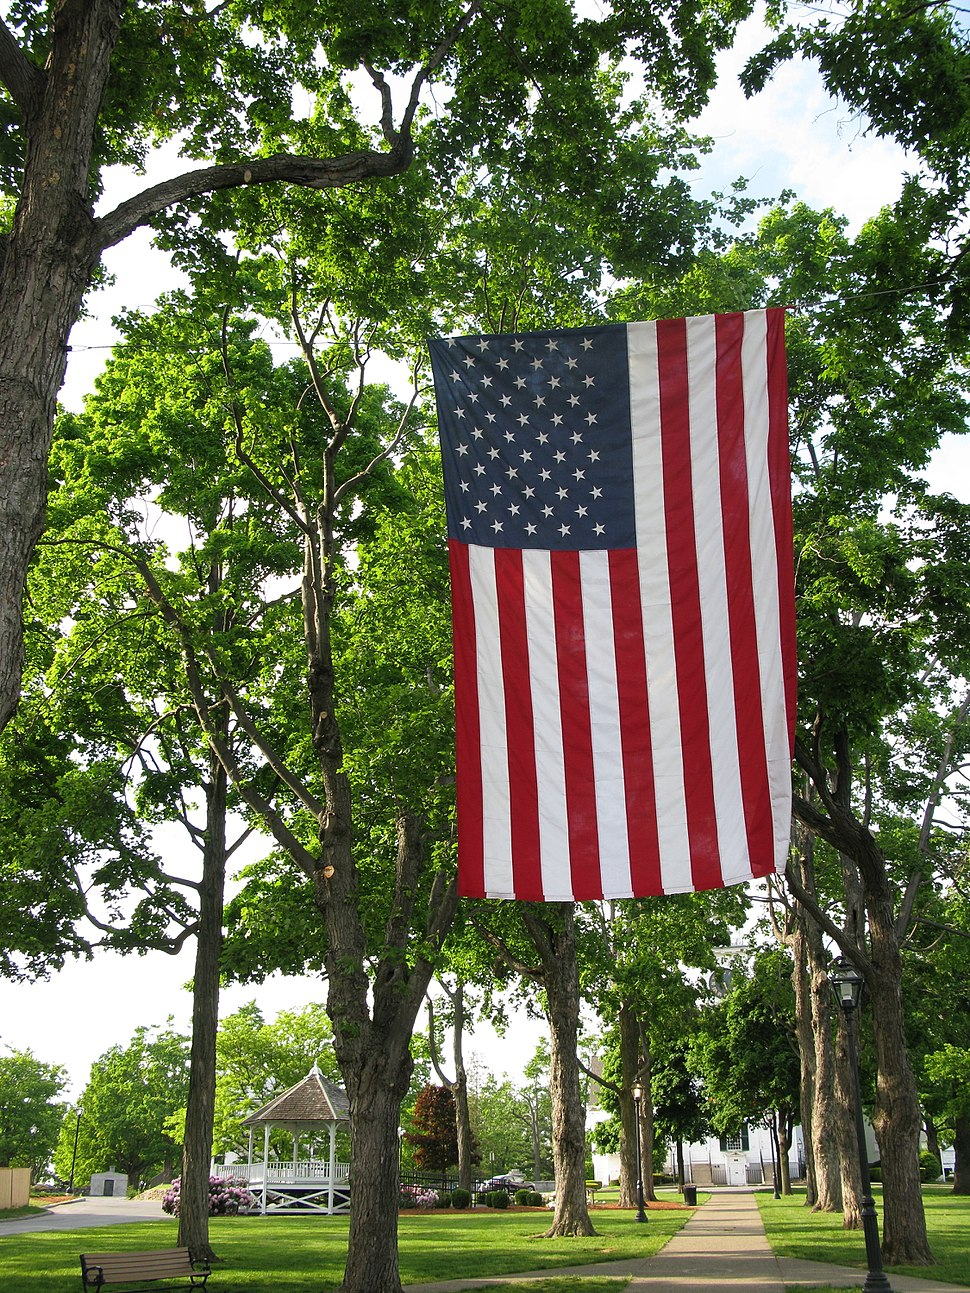 Shrewsbury Common U.S. flag display for Memorial Day